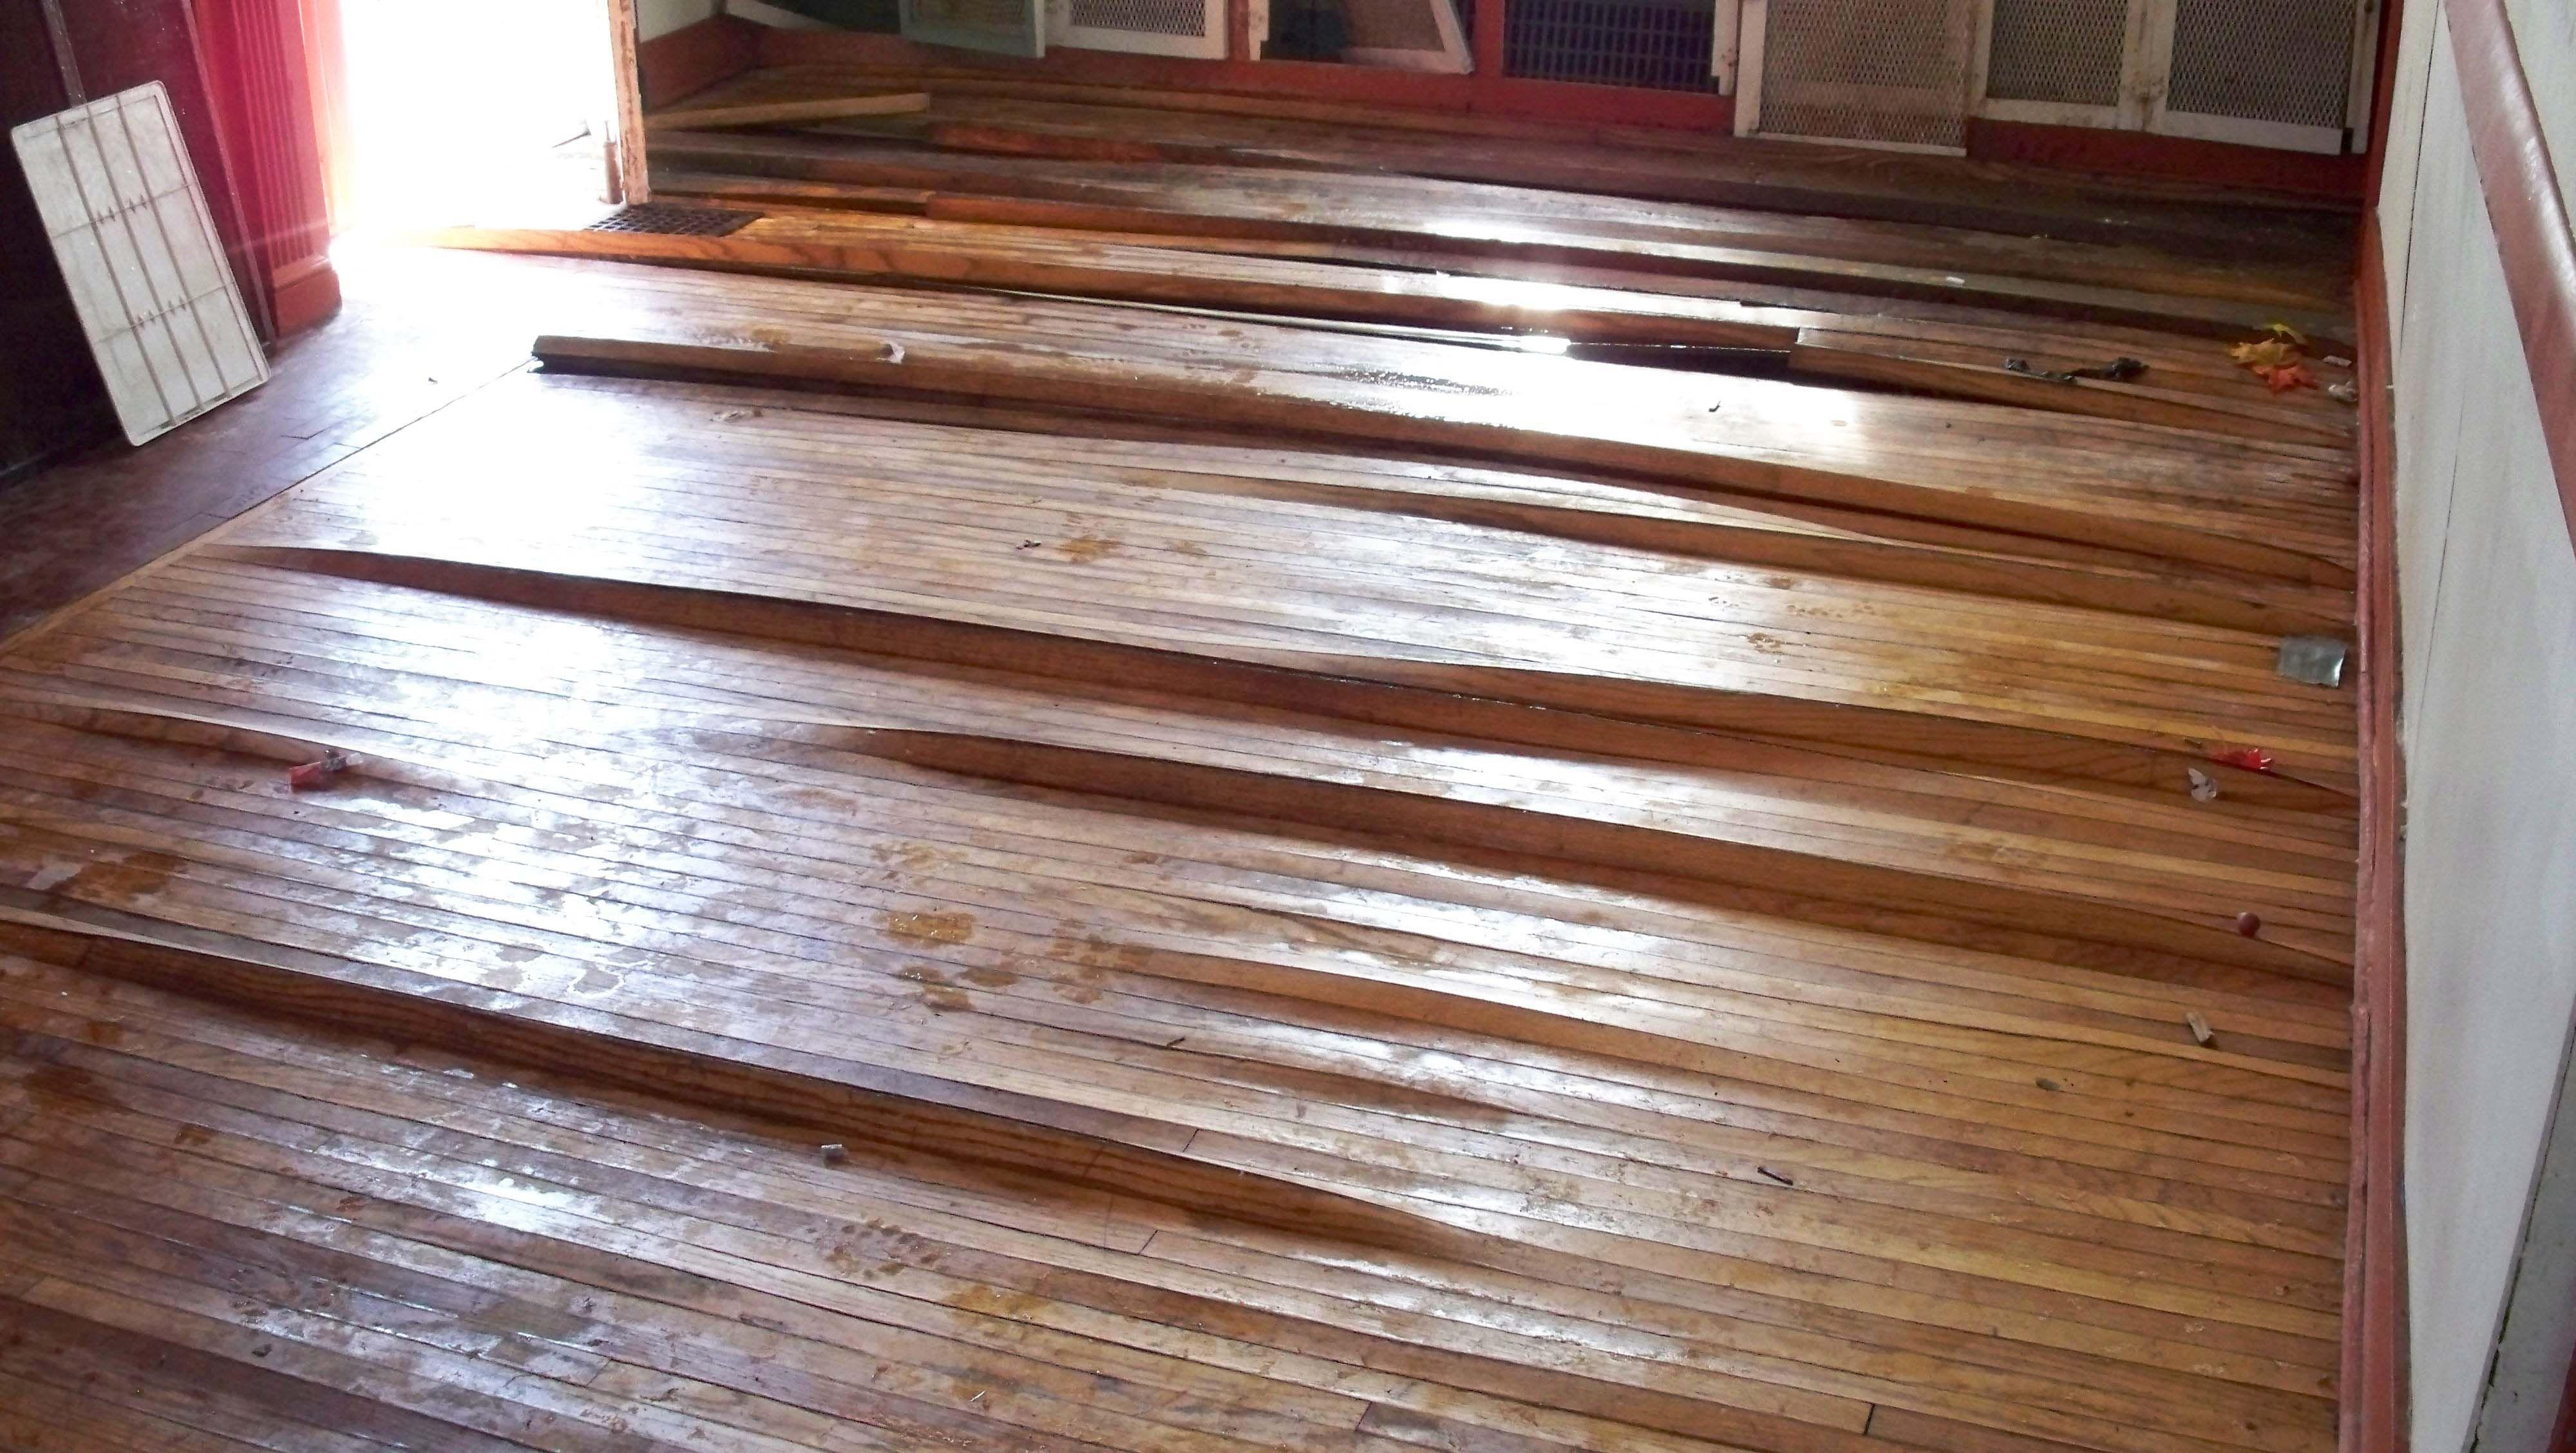 best product to clean engineered hardwood floors of hardwood floor water damage warping hardwood floors pinterest inside hardwood floor water damage warping